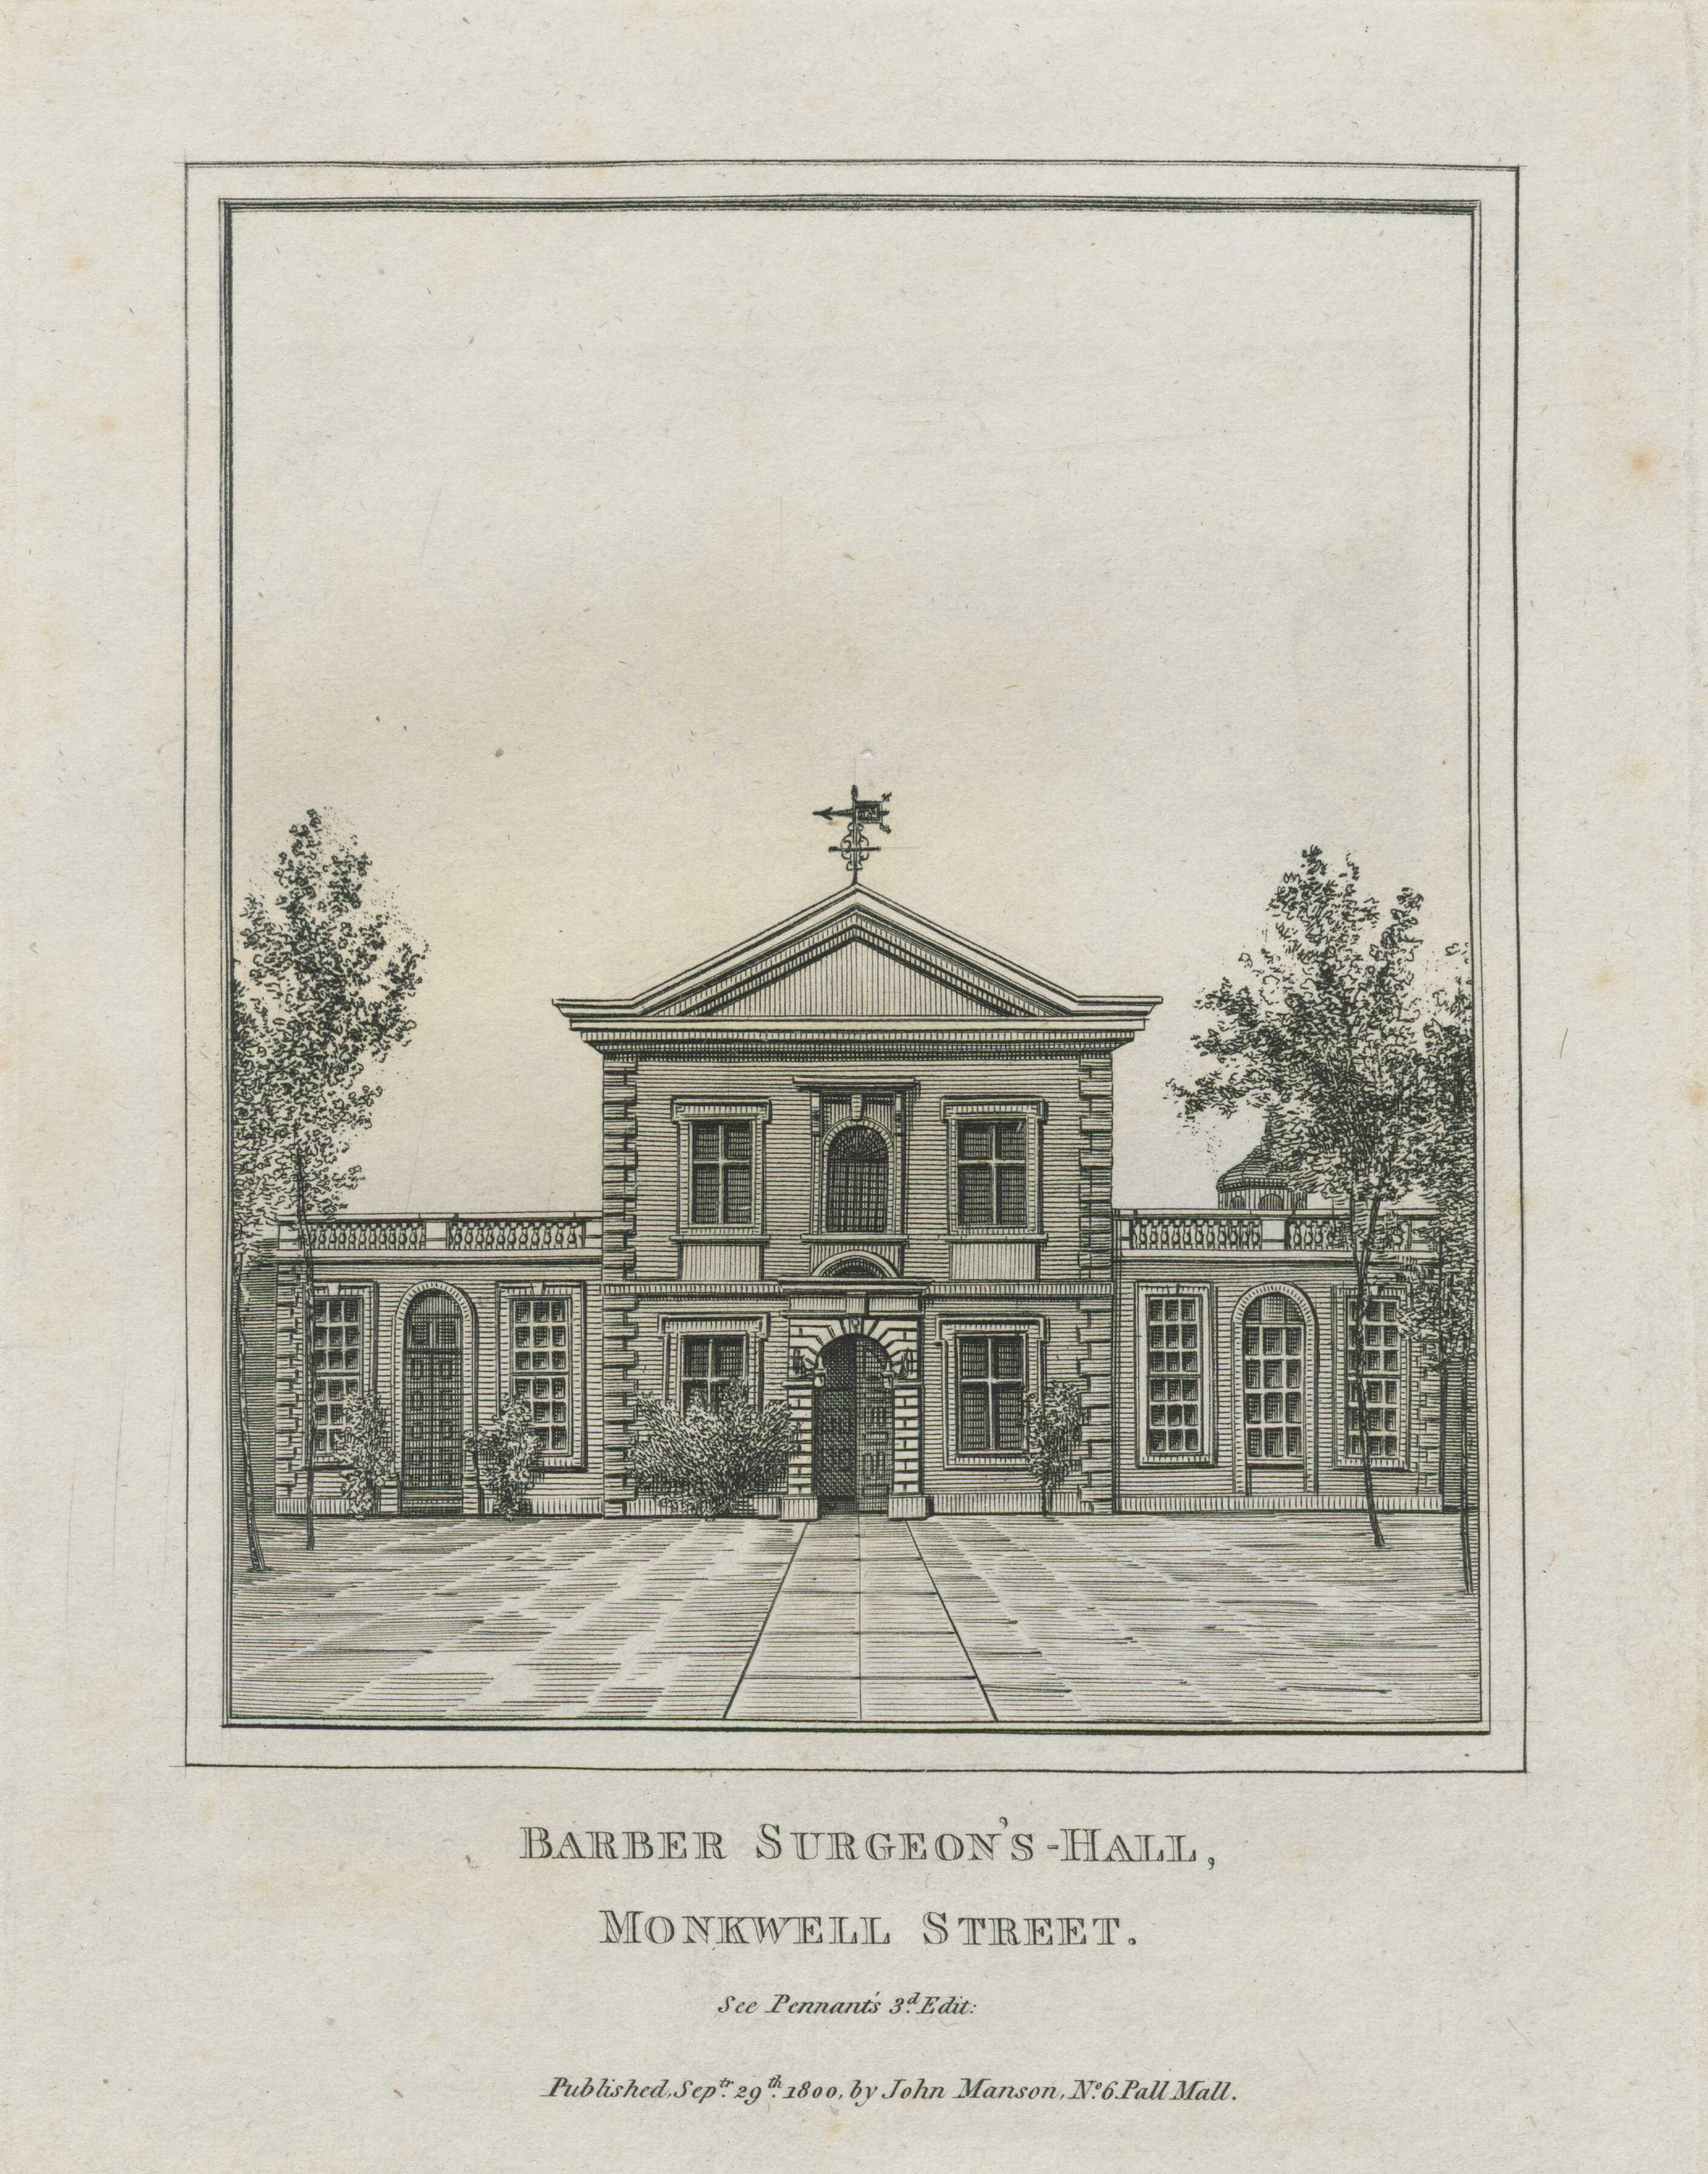 89-barber-surgeons-hall-monkwell-street